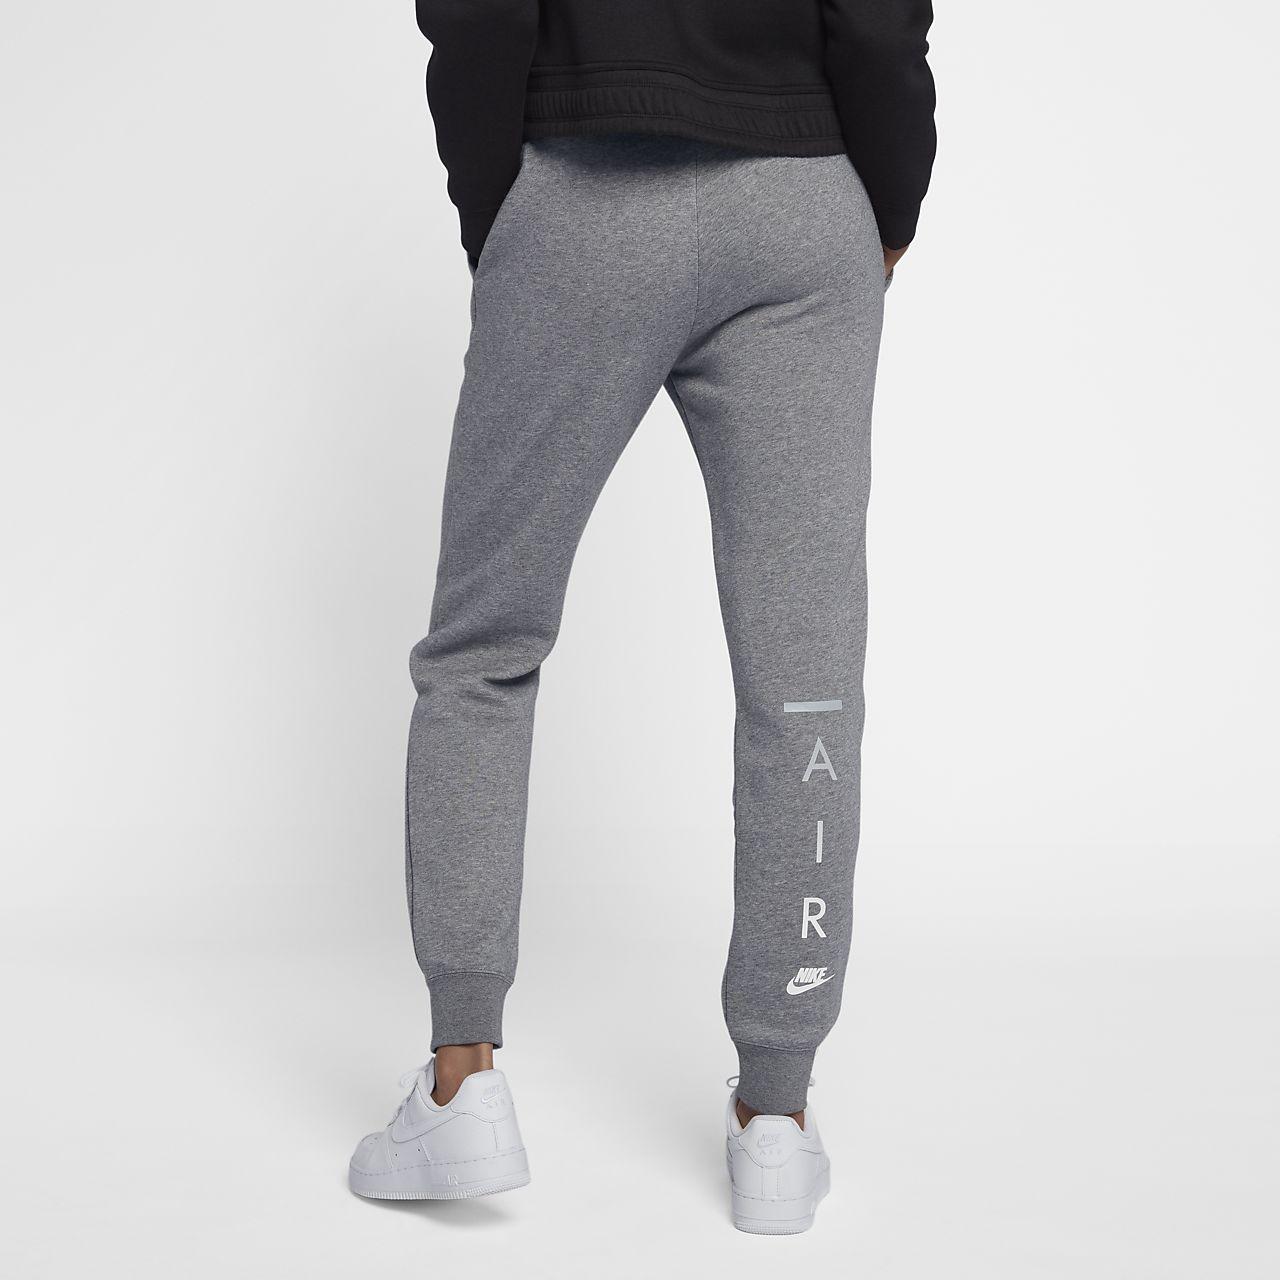 Nike Air Women's Fleece Trousers Olive | Nike air women